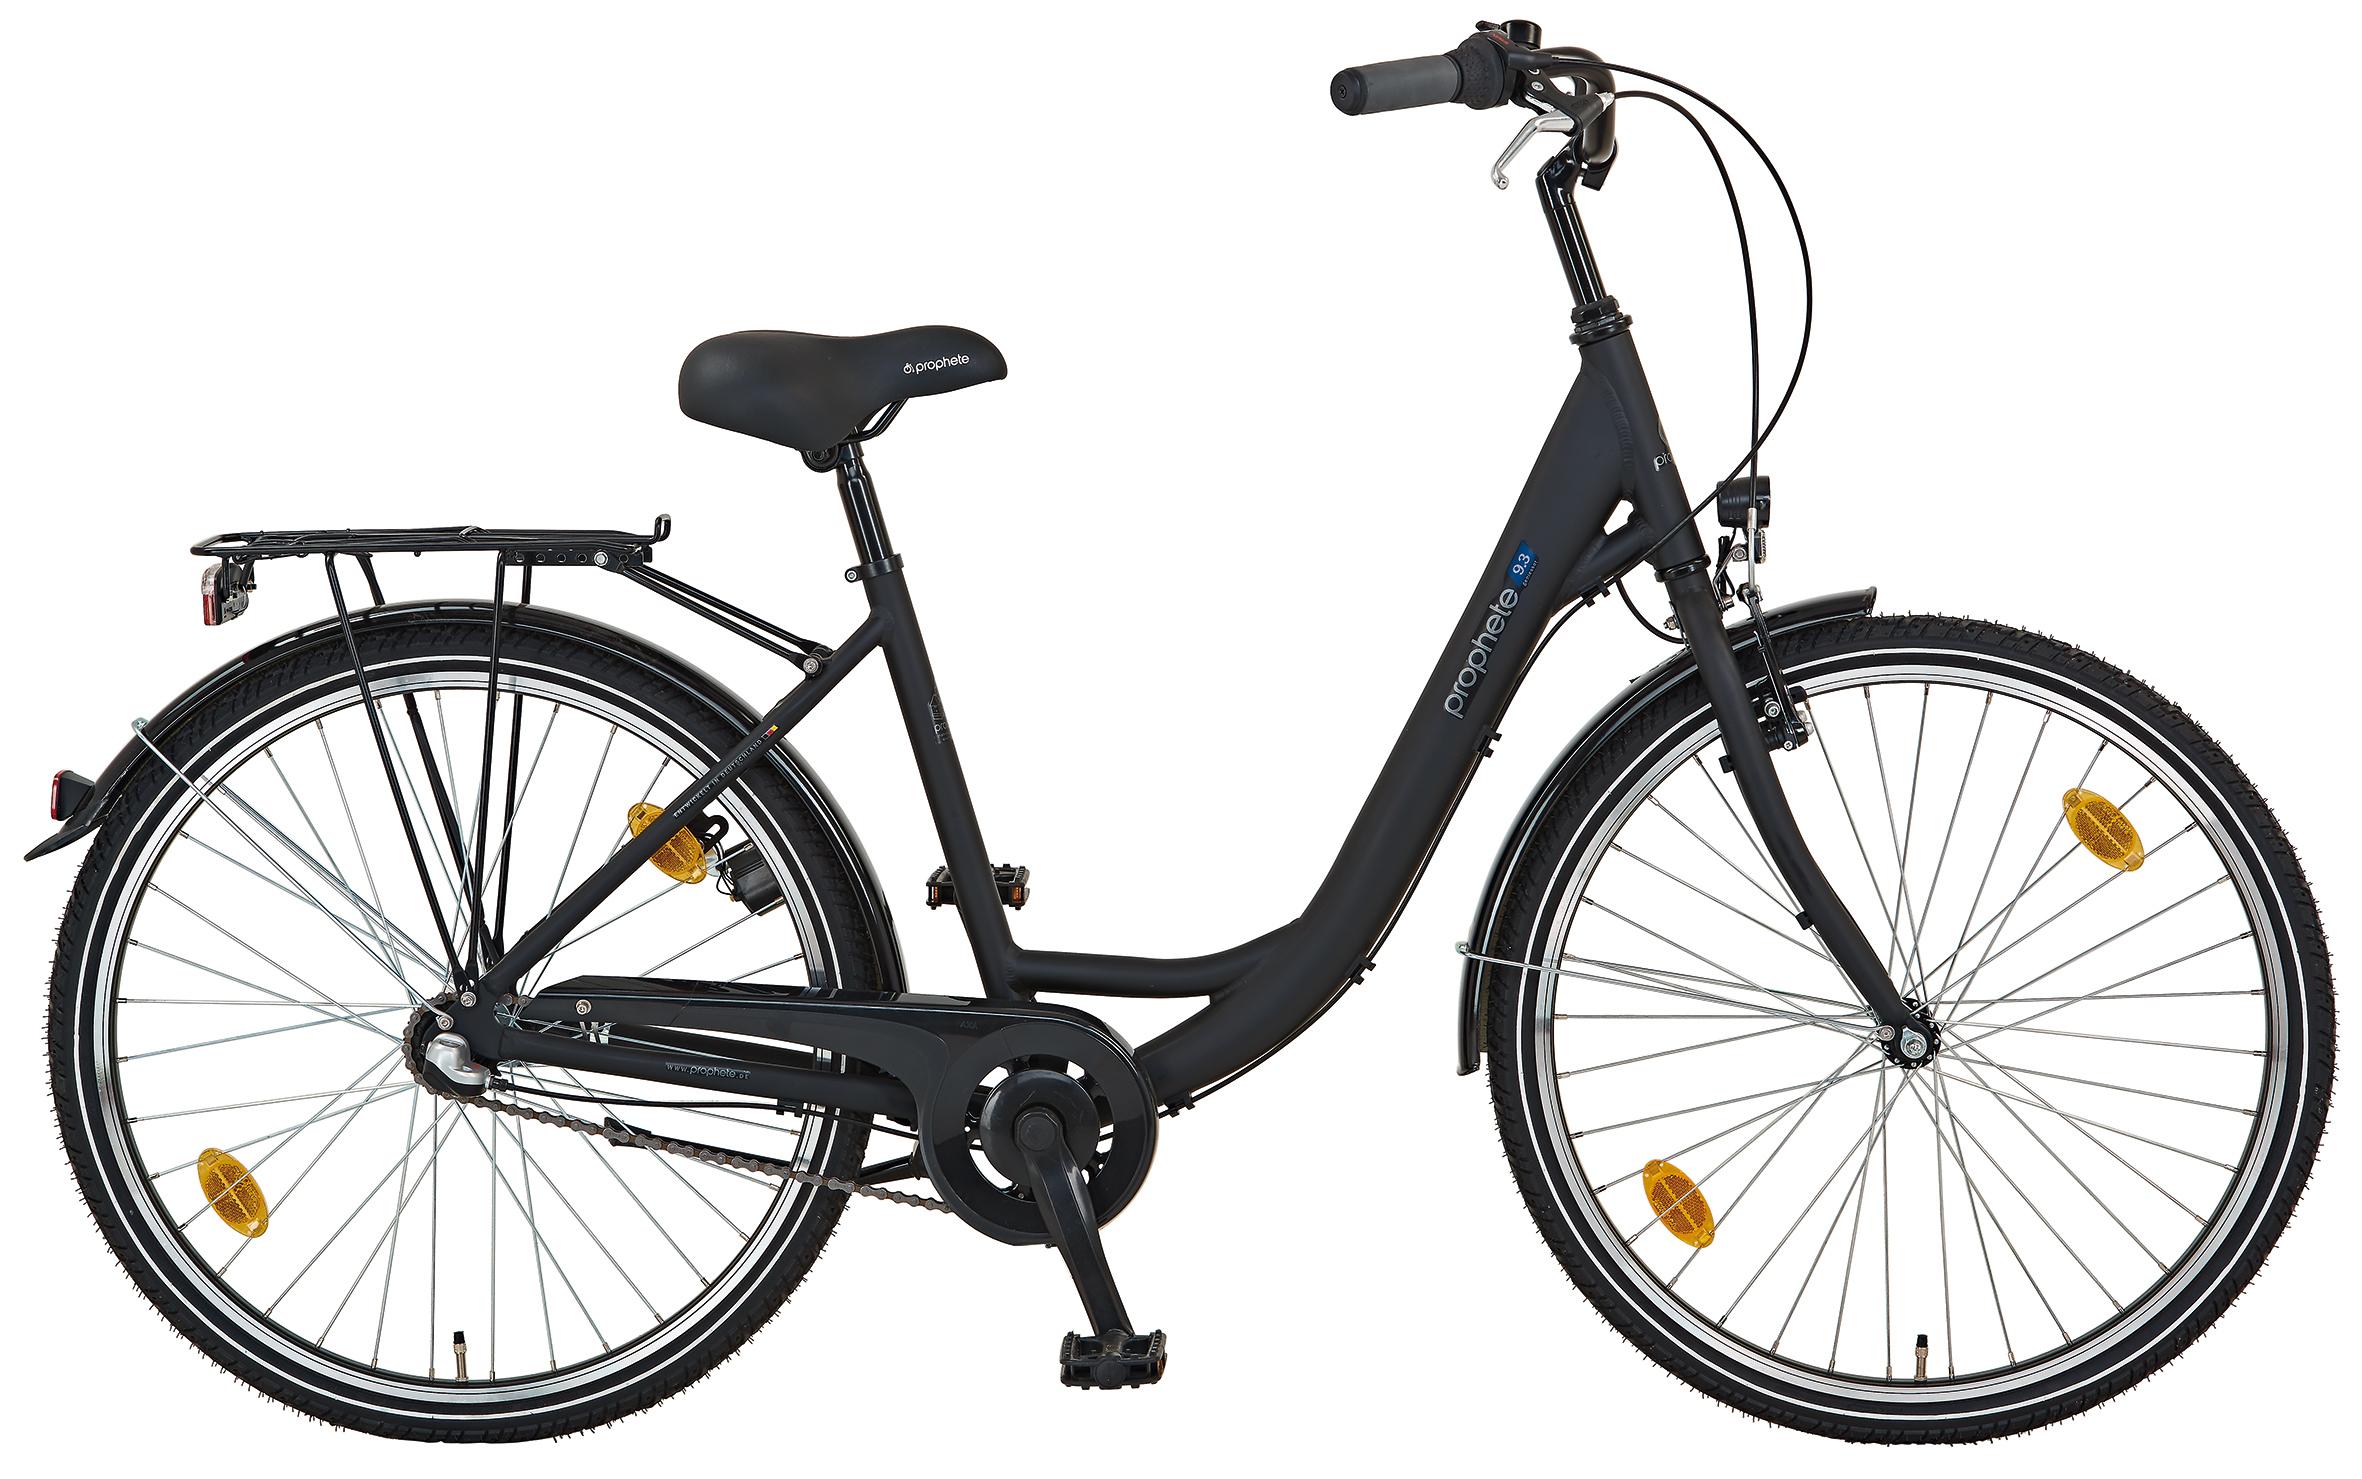 "Prophete Fahrrad / Cityrad Geniesser 9.3 City Bike 26"" Damen Bild 1"